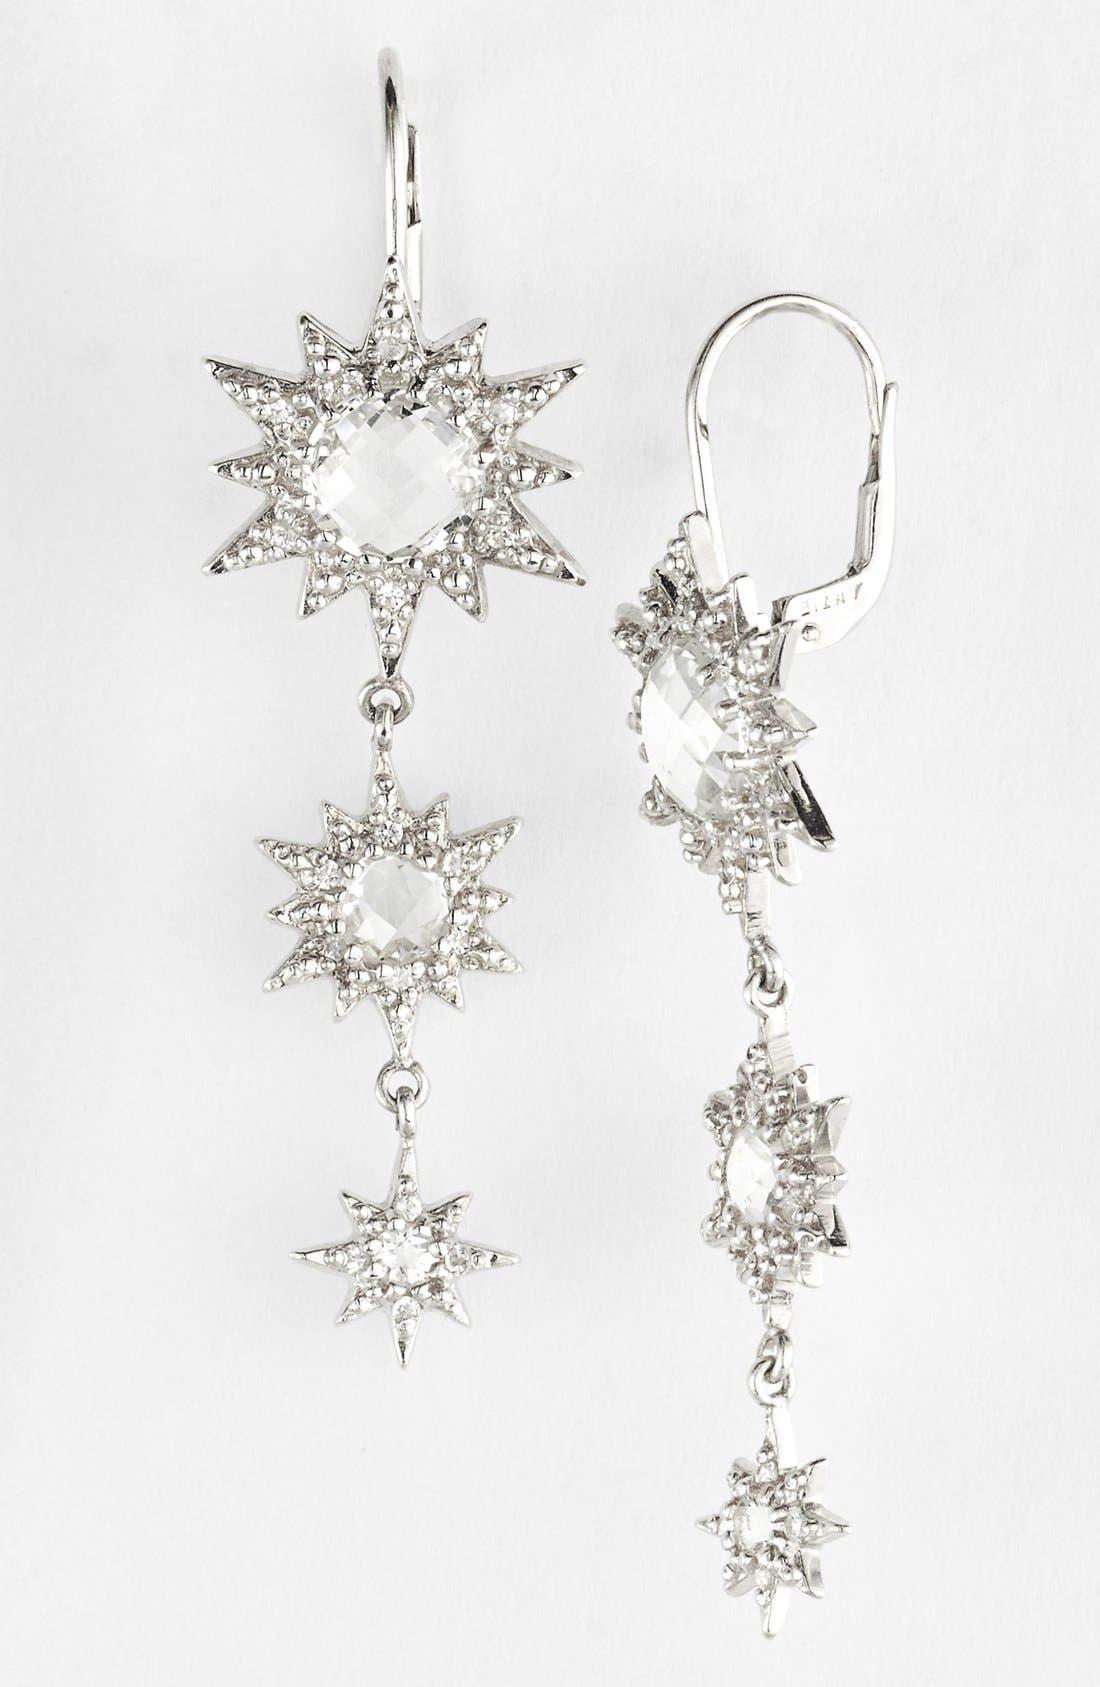 Alternate Image 1 Selected - Anzie 'Aztec' Starburst Linear Earrings (Nordstrom Exclusive)